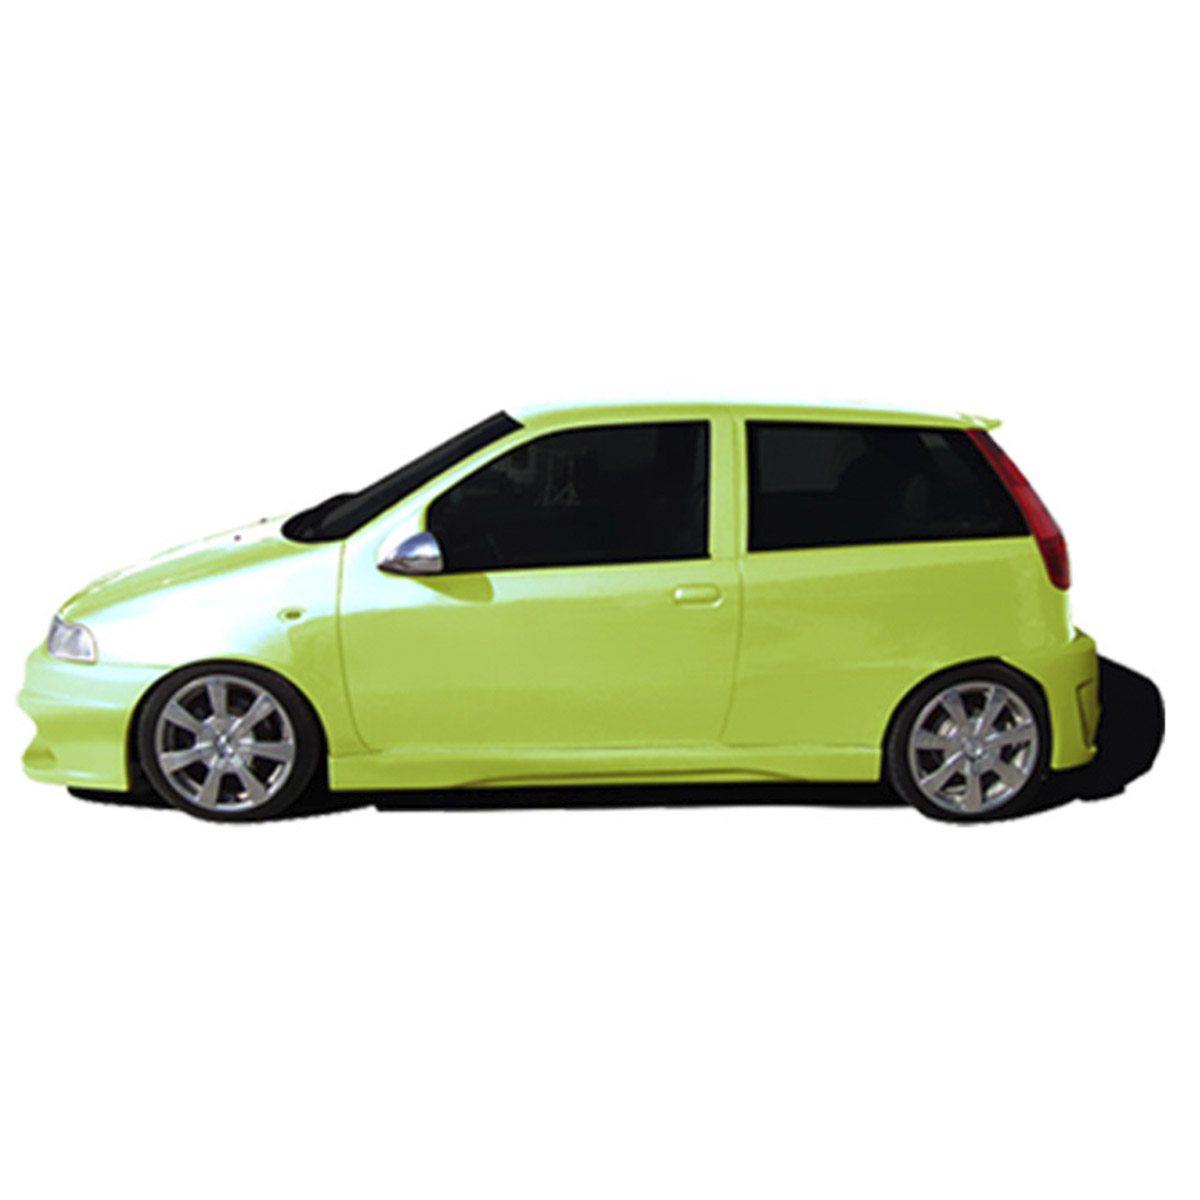 Fiat-Punto-I-Sphinx-Emb-EBS029